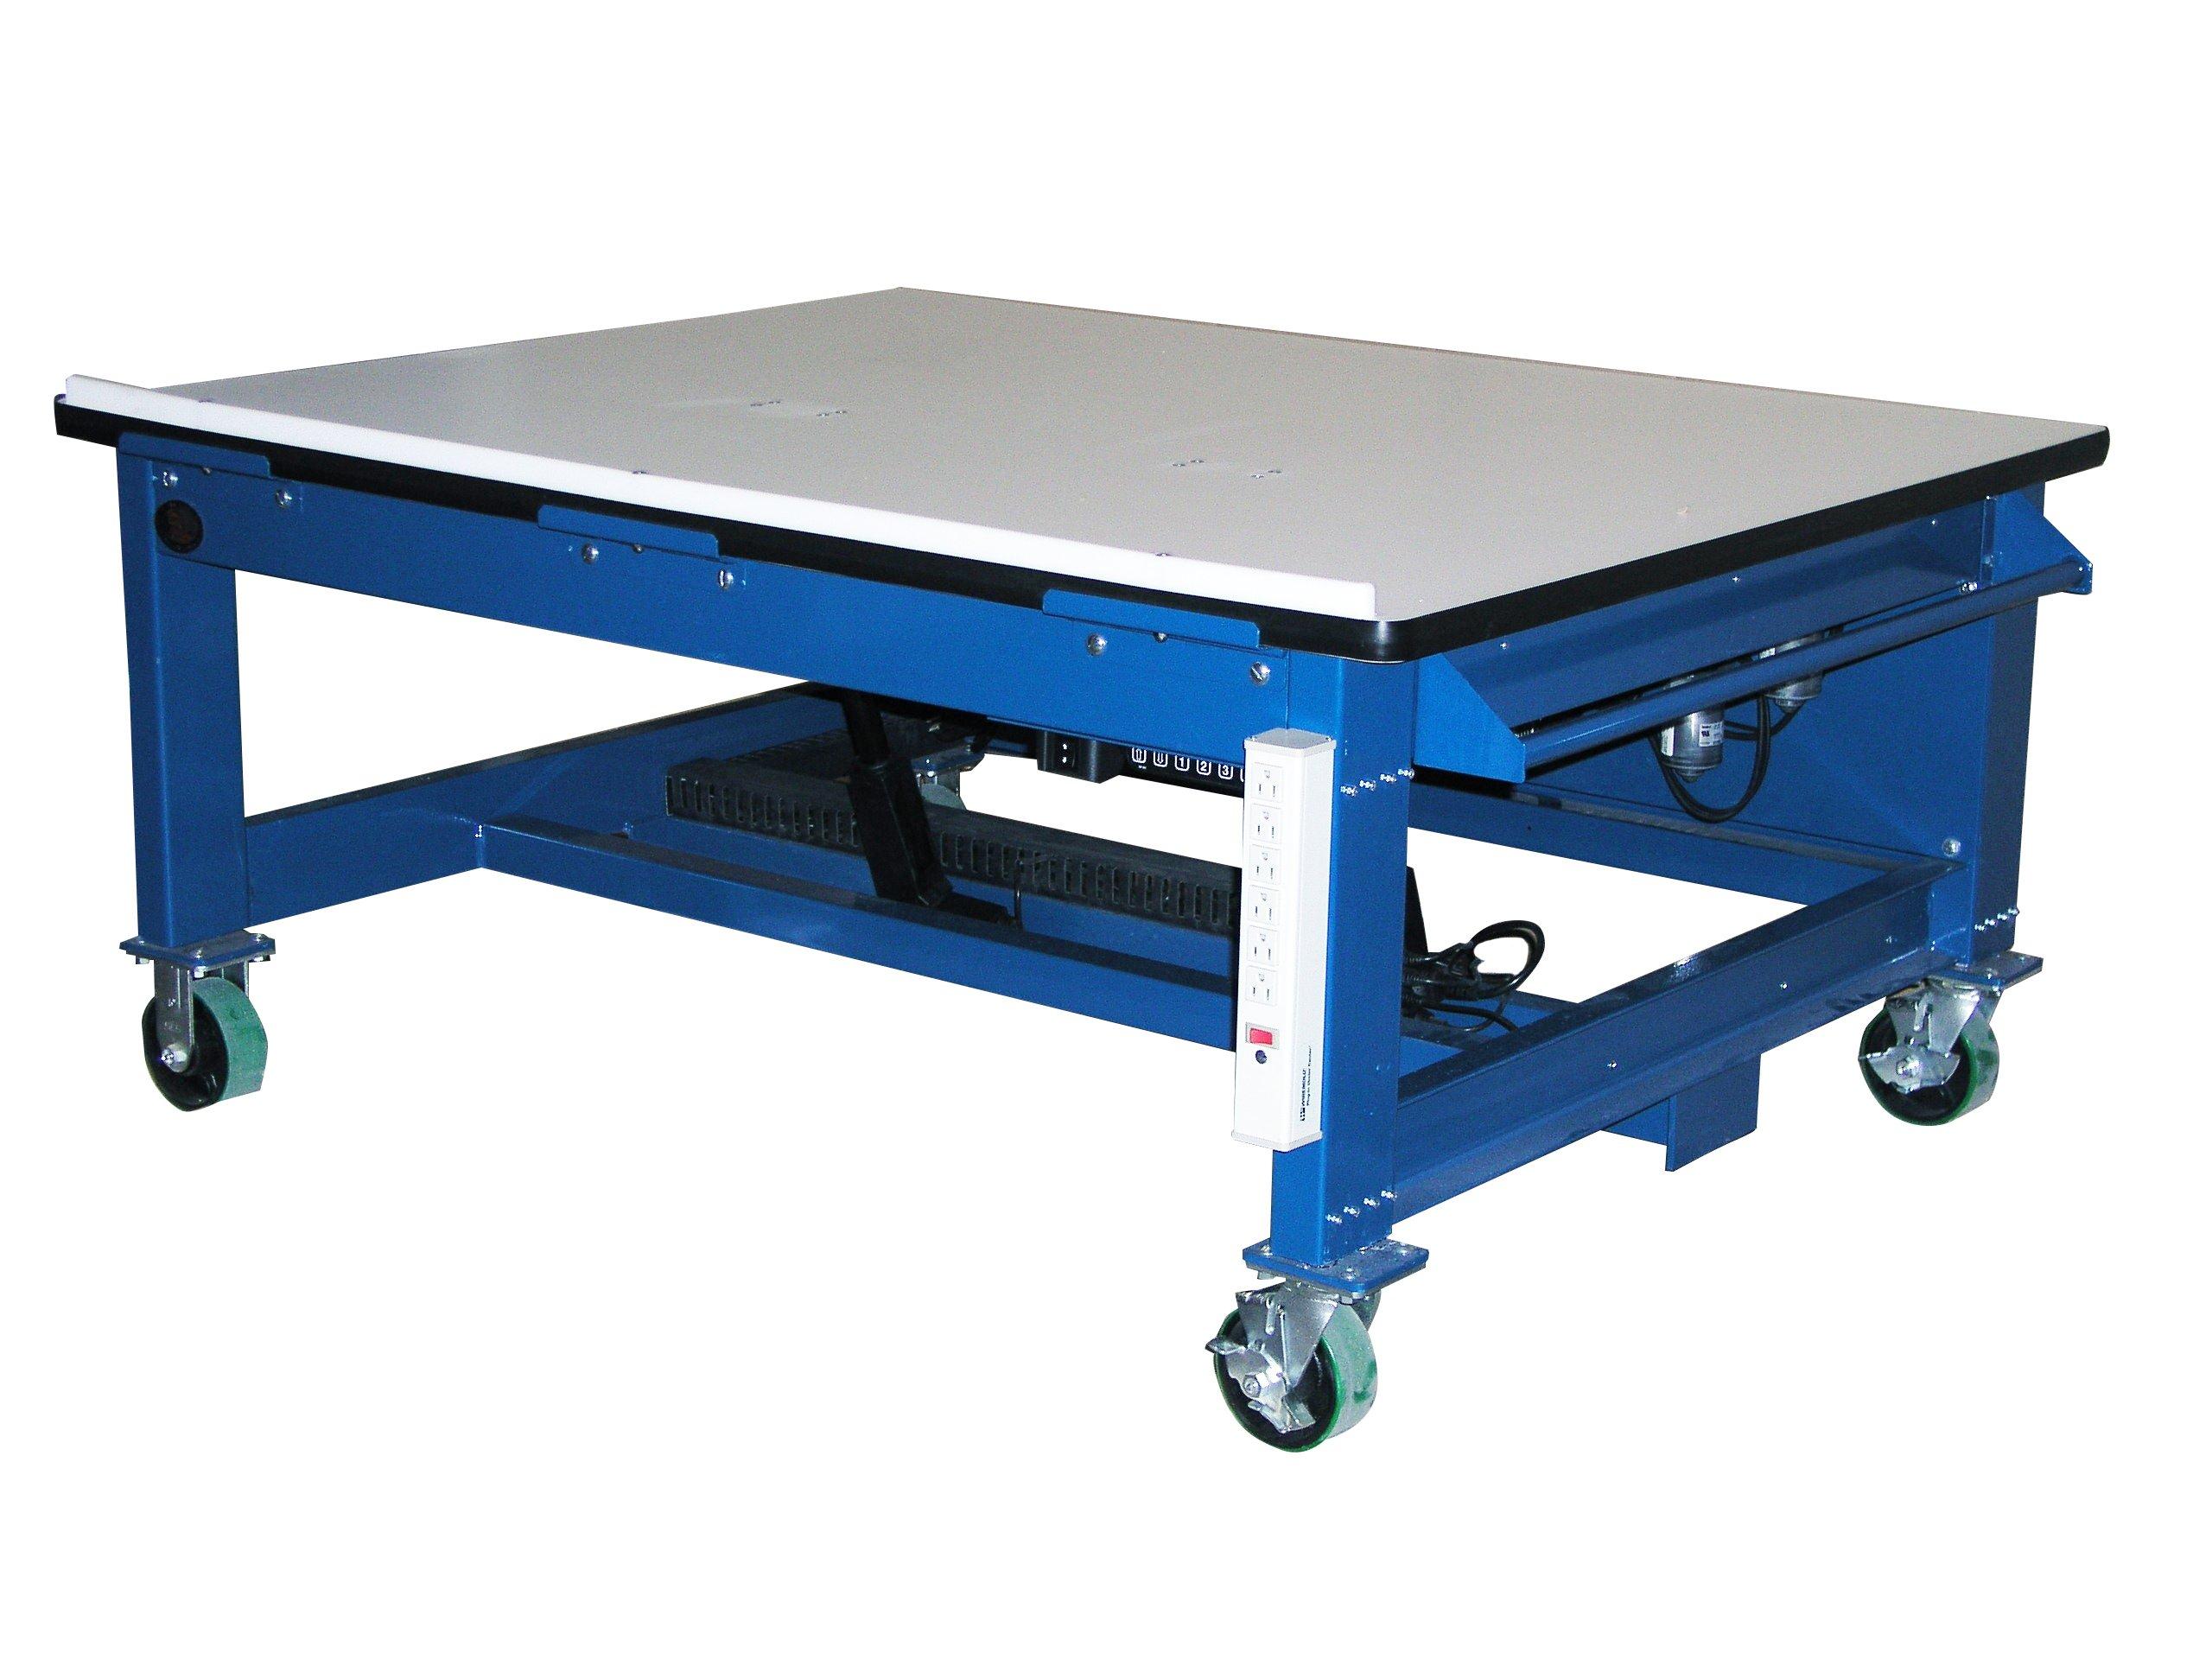 Proline | Modular Ergonomic Workbenches